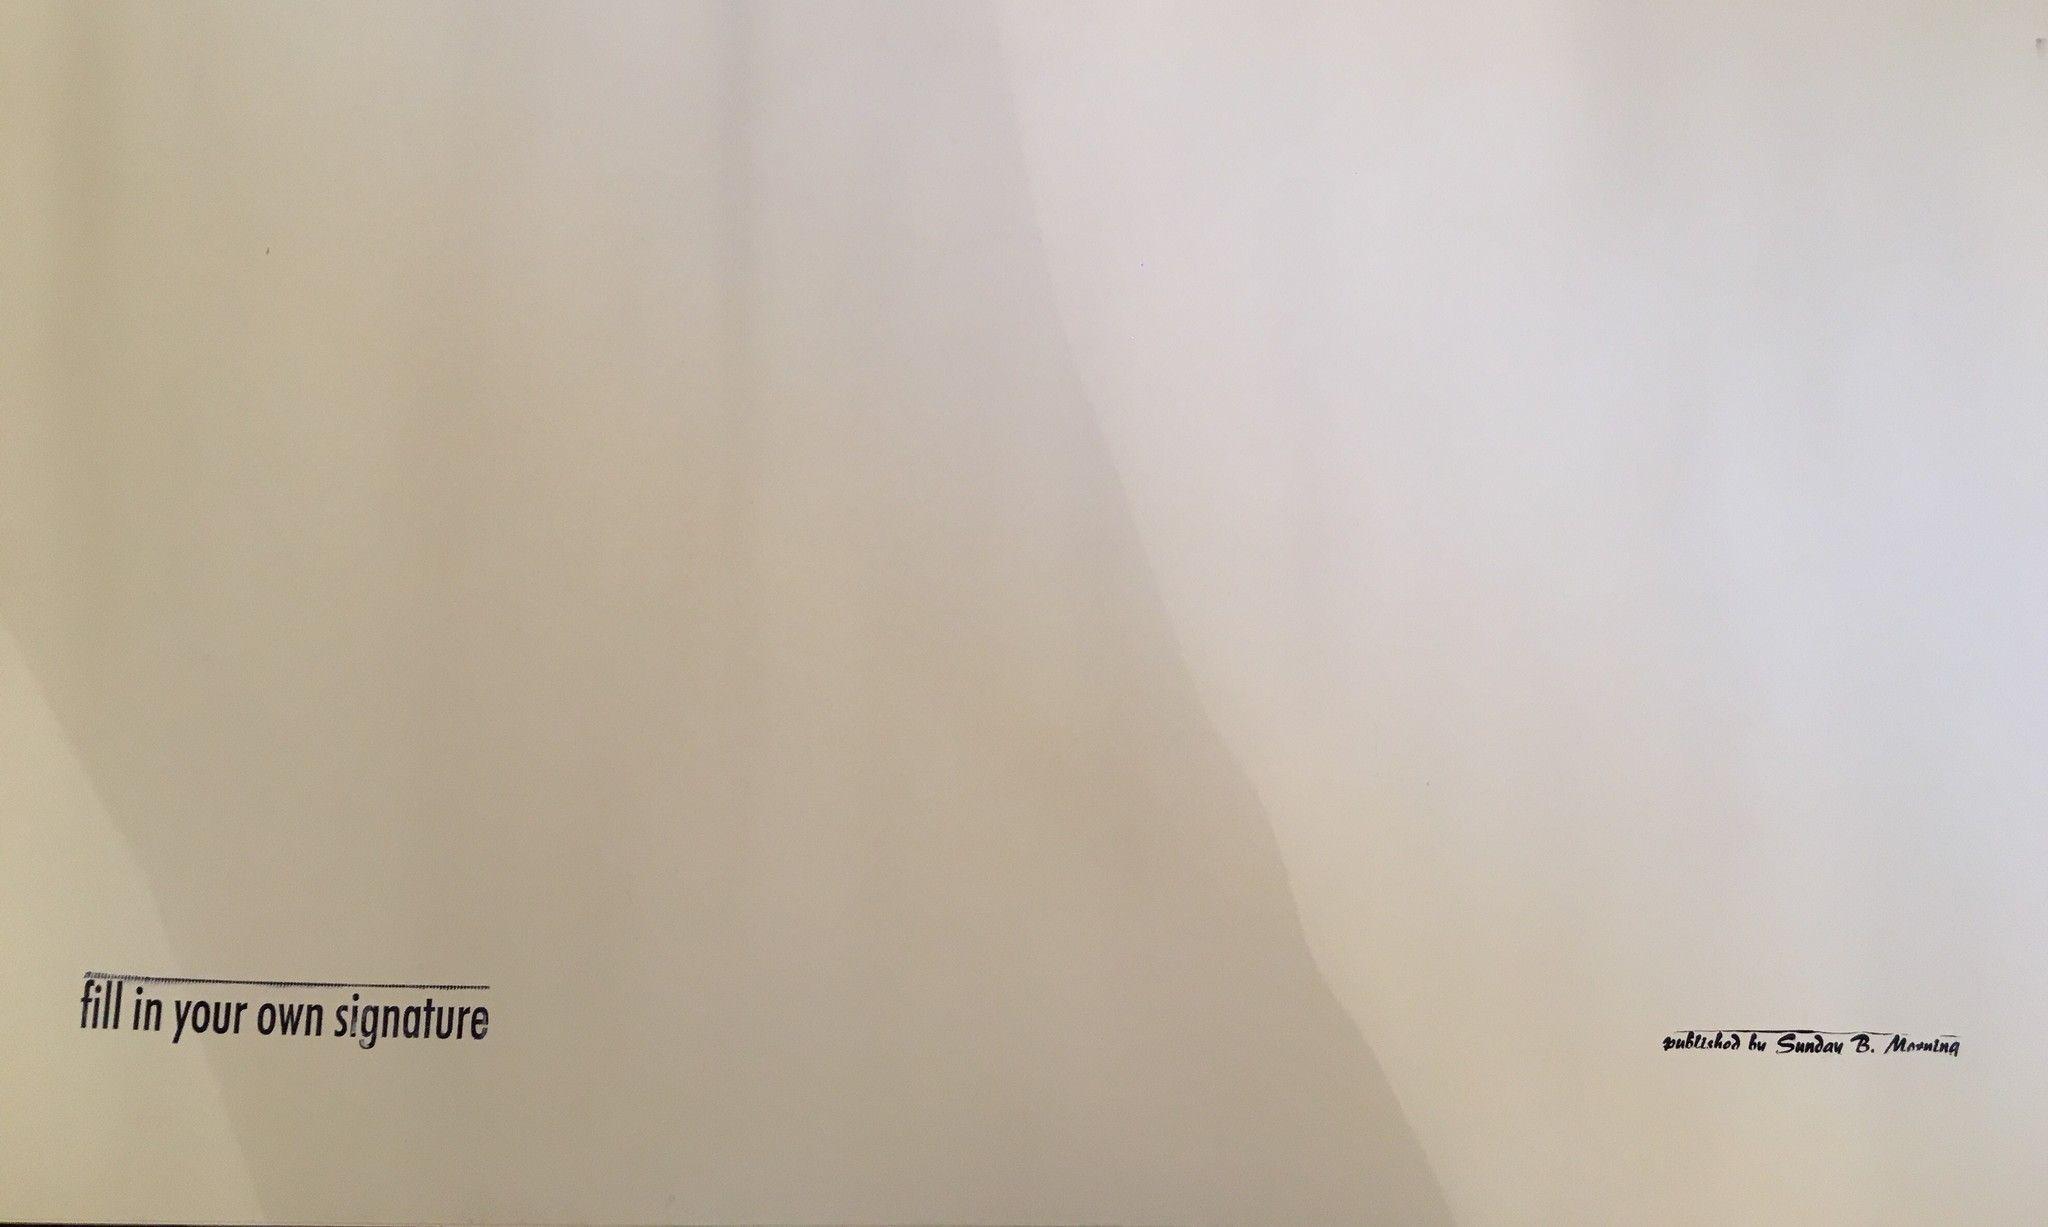 SERIGRAFIA ANDY WARHOL ' MARILYN 9 '  dimensioni L 91,5 x H 91,5 cm.